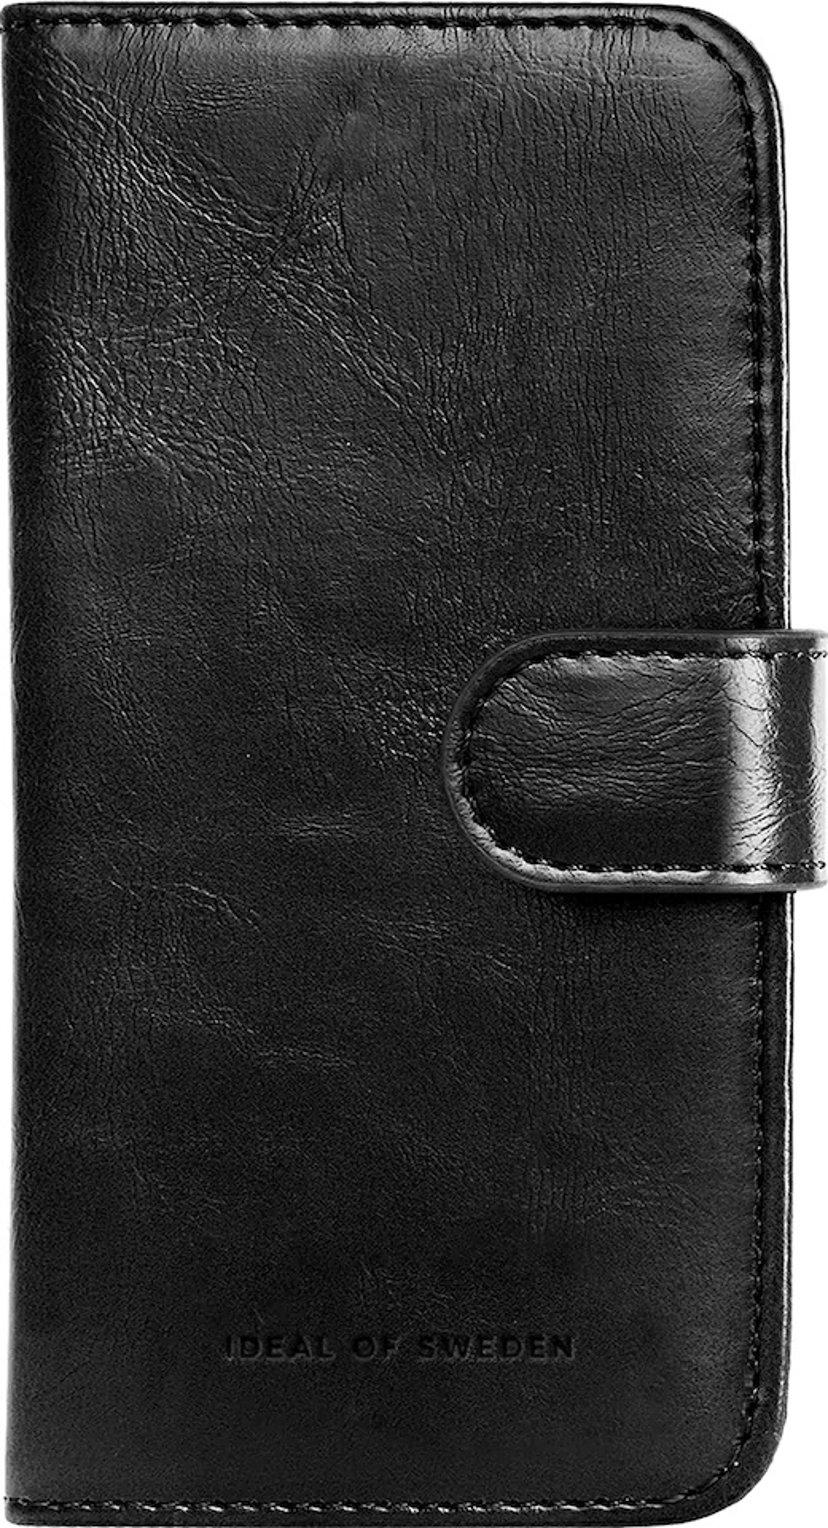 iDeal of Sweden IDEAL Magnet Wallet+ iPhone 12, iPhone 12 Pro Sort